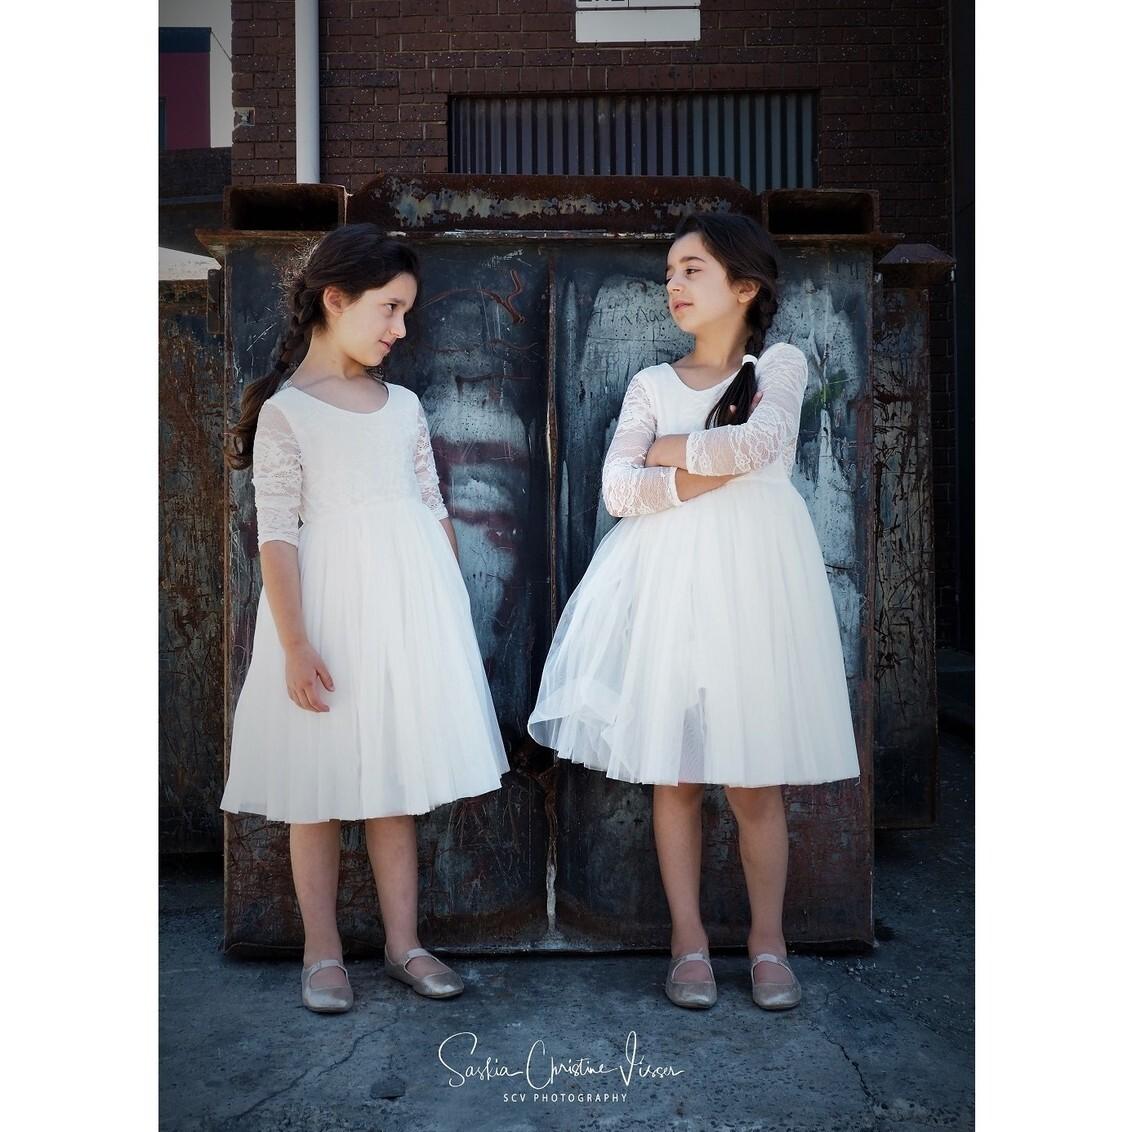 Who's boss - the bridesmaids - foto door SCV1564 op 31-01-2020 - deze foto bevat: portret, model, daglicht, kinderen, fashion, meisje, beauty, straatfotografie, fotoshoot